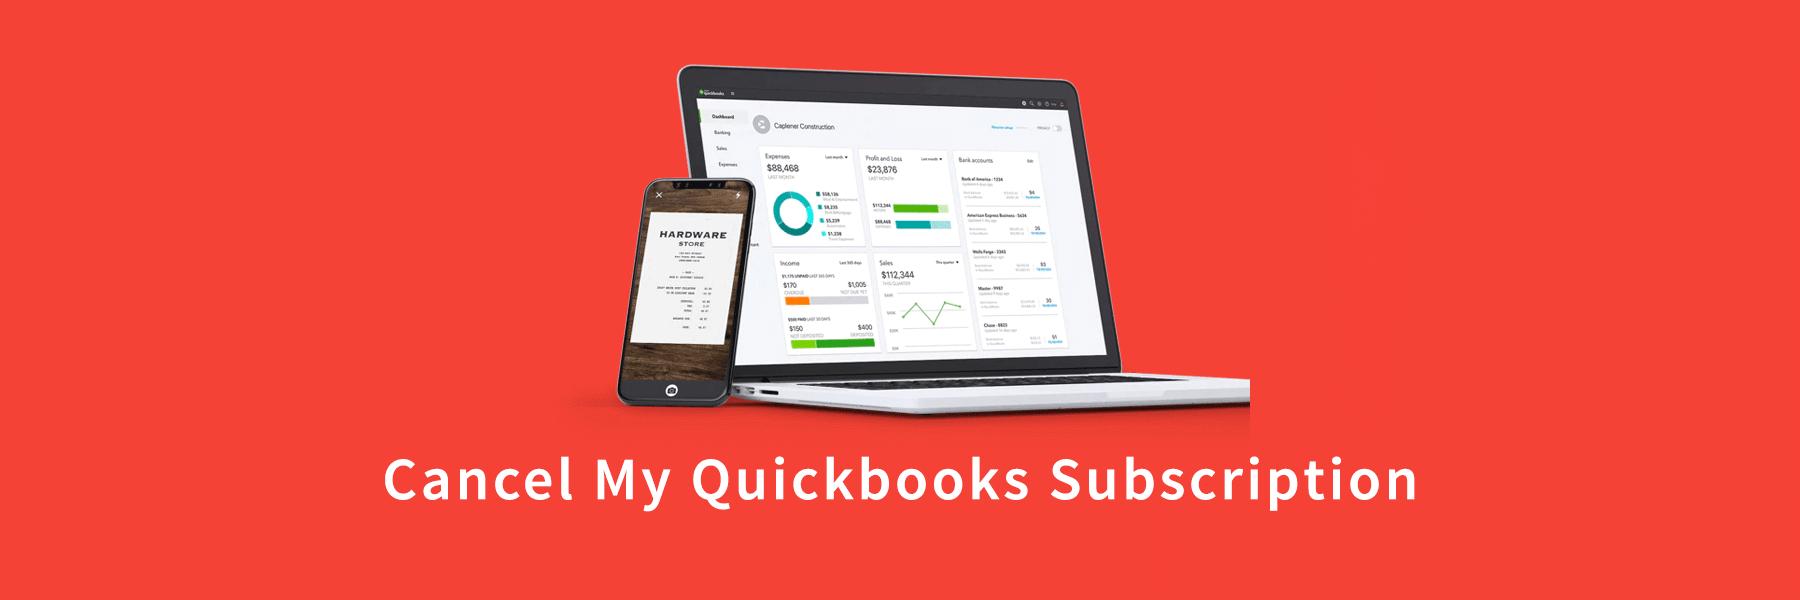 Cancel My Quickbooks Subscription